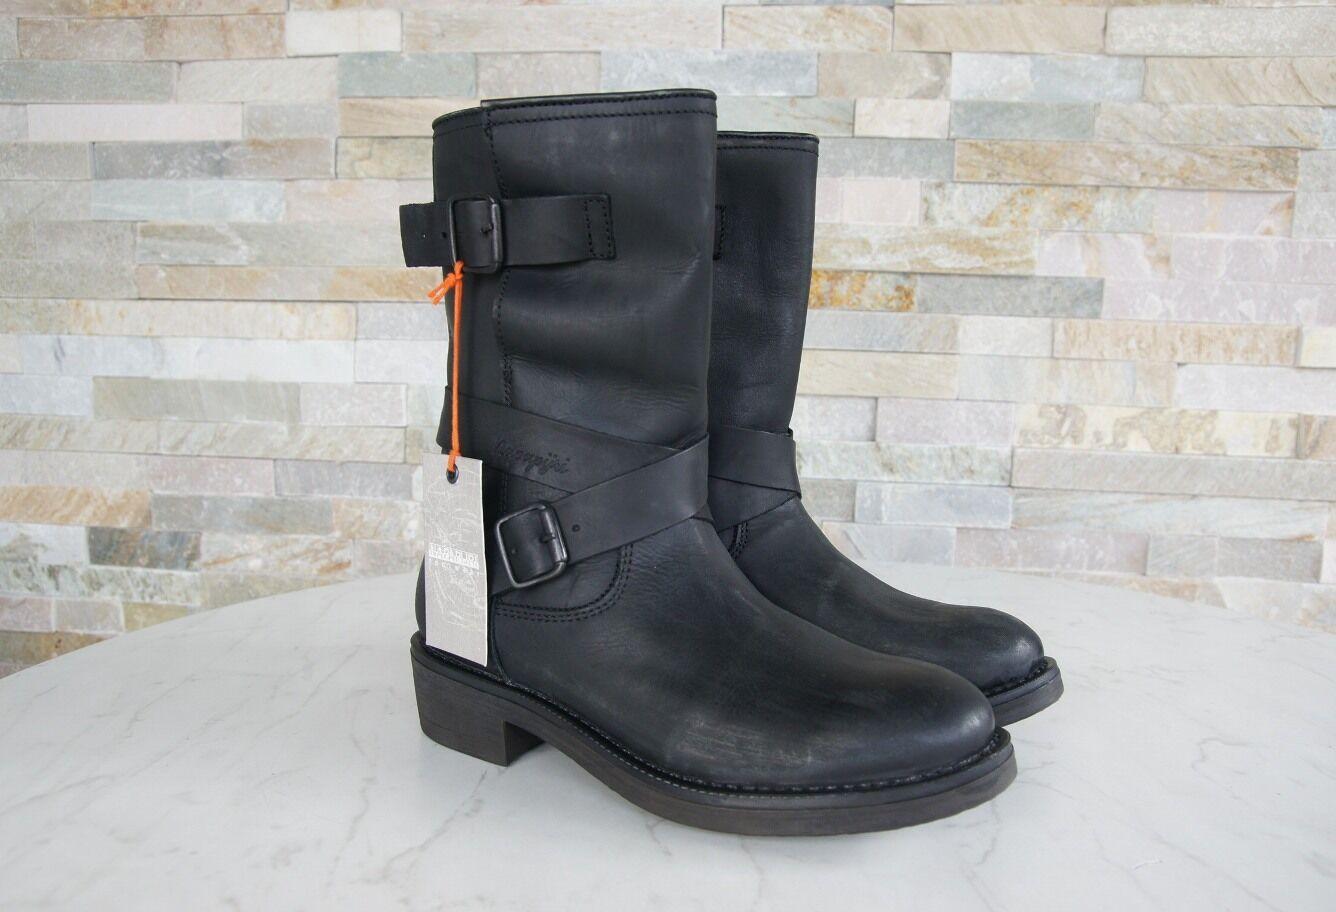 Napapijri 36 botas nuevo botines botas zapatos maia negro nuevo botas ex PVP 11df72